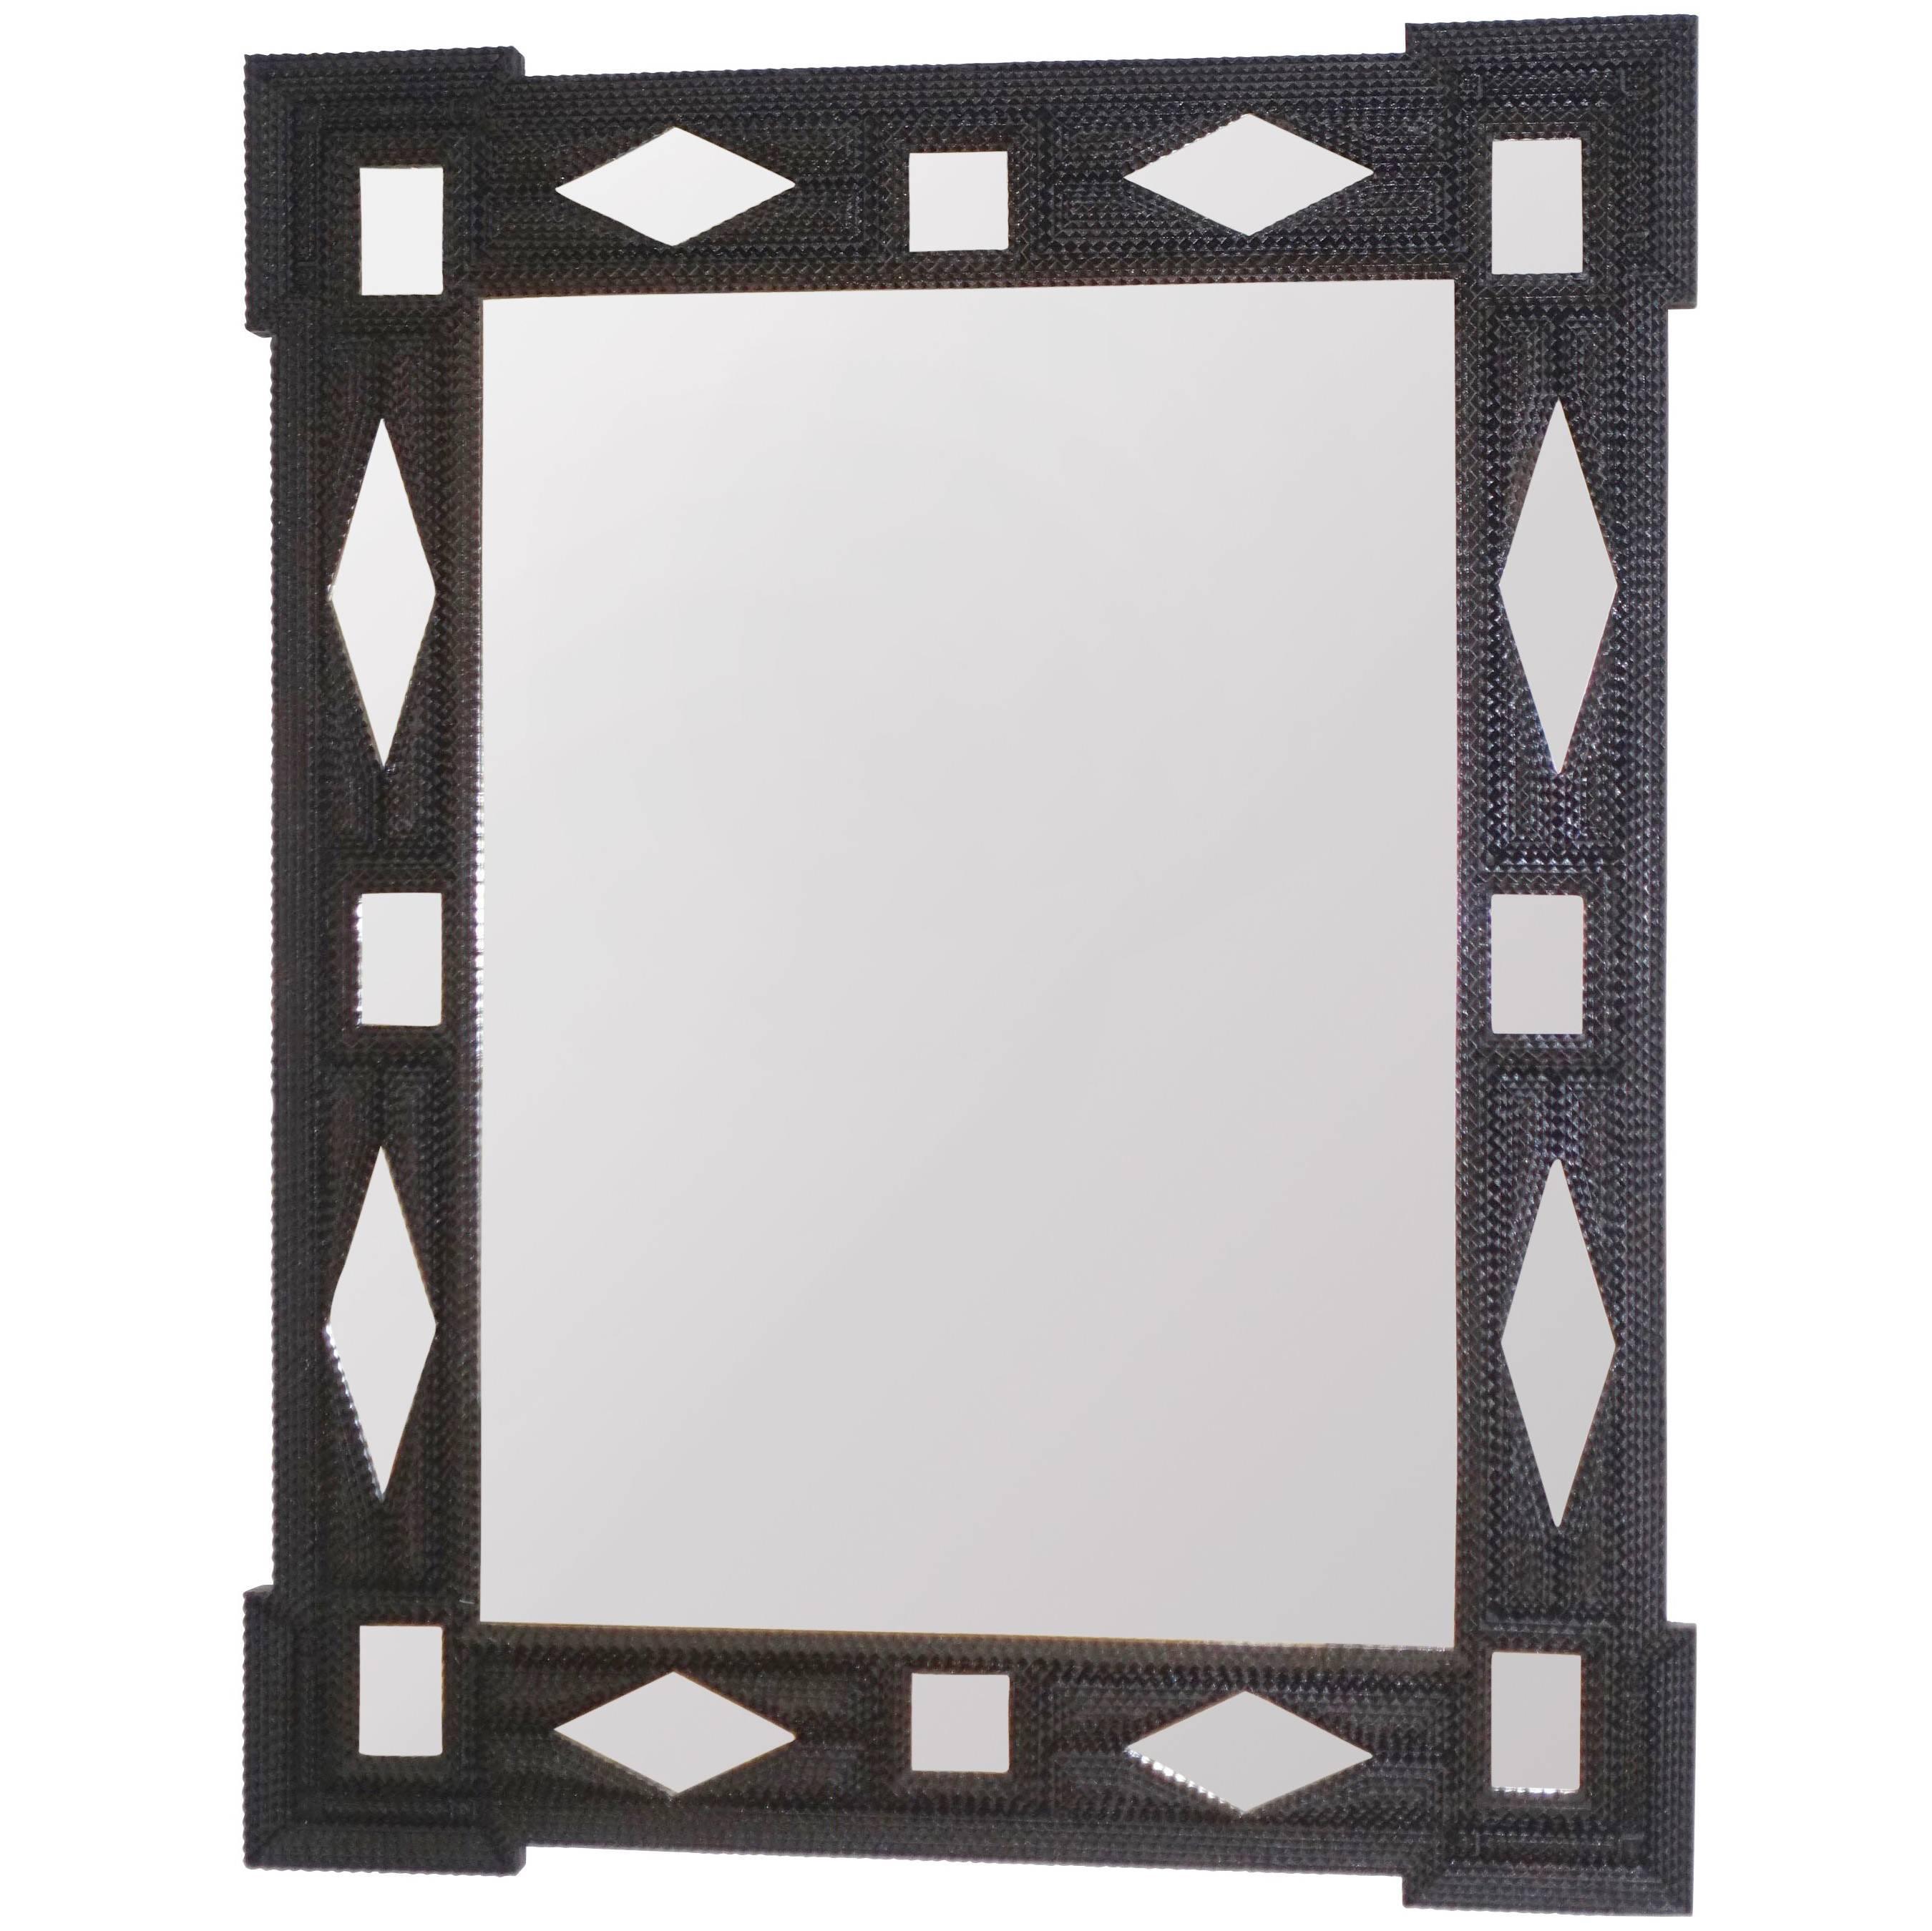 William Kent Style Gilded Frame Mirror, England Circa 1890 (33W